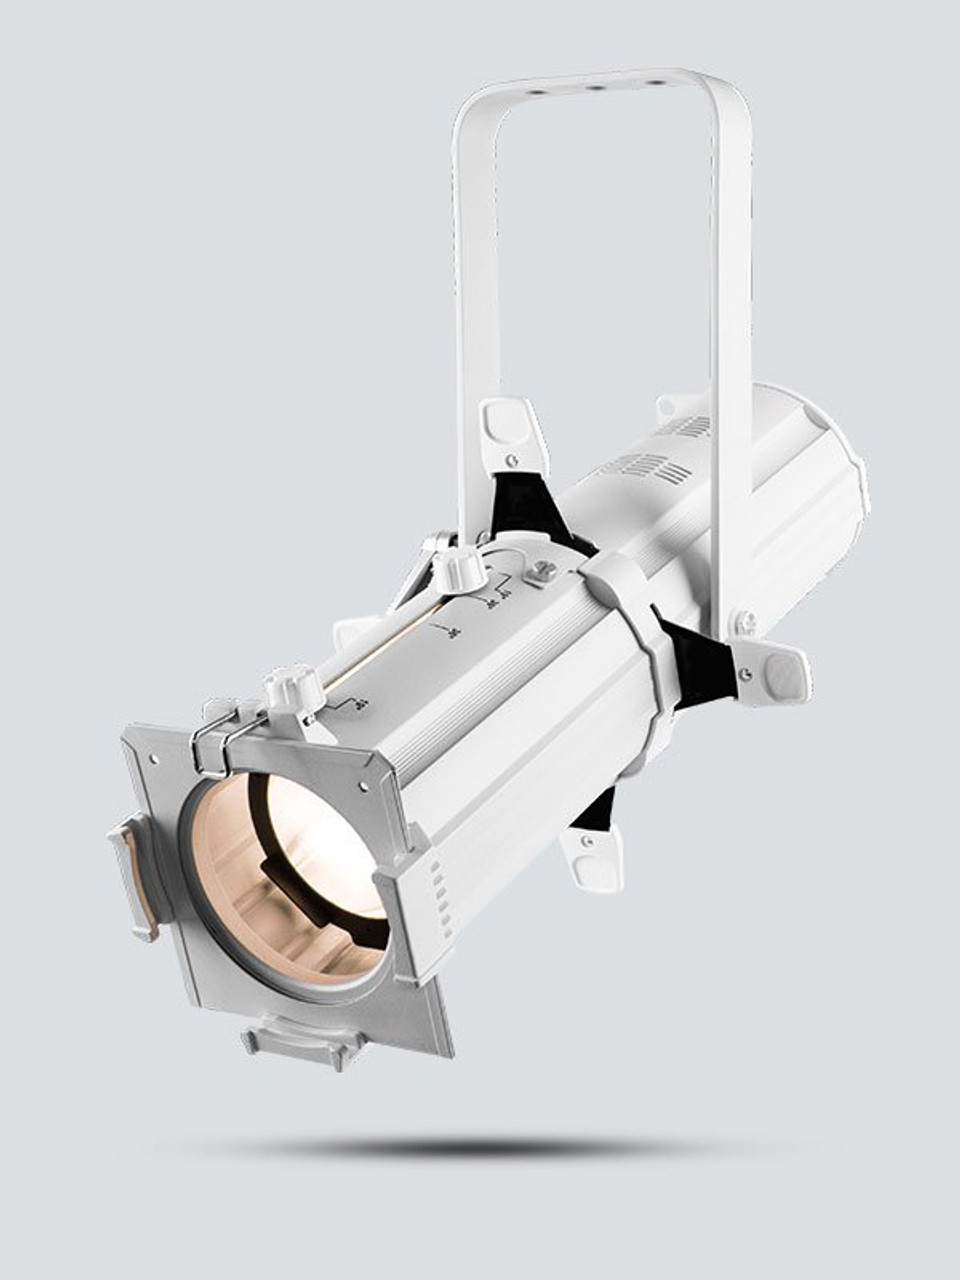 Chauvet DJ EVEE50ZWHT 50W LED Ellipsoidal